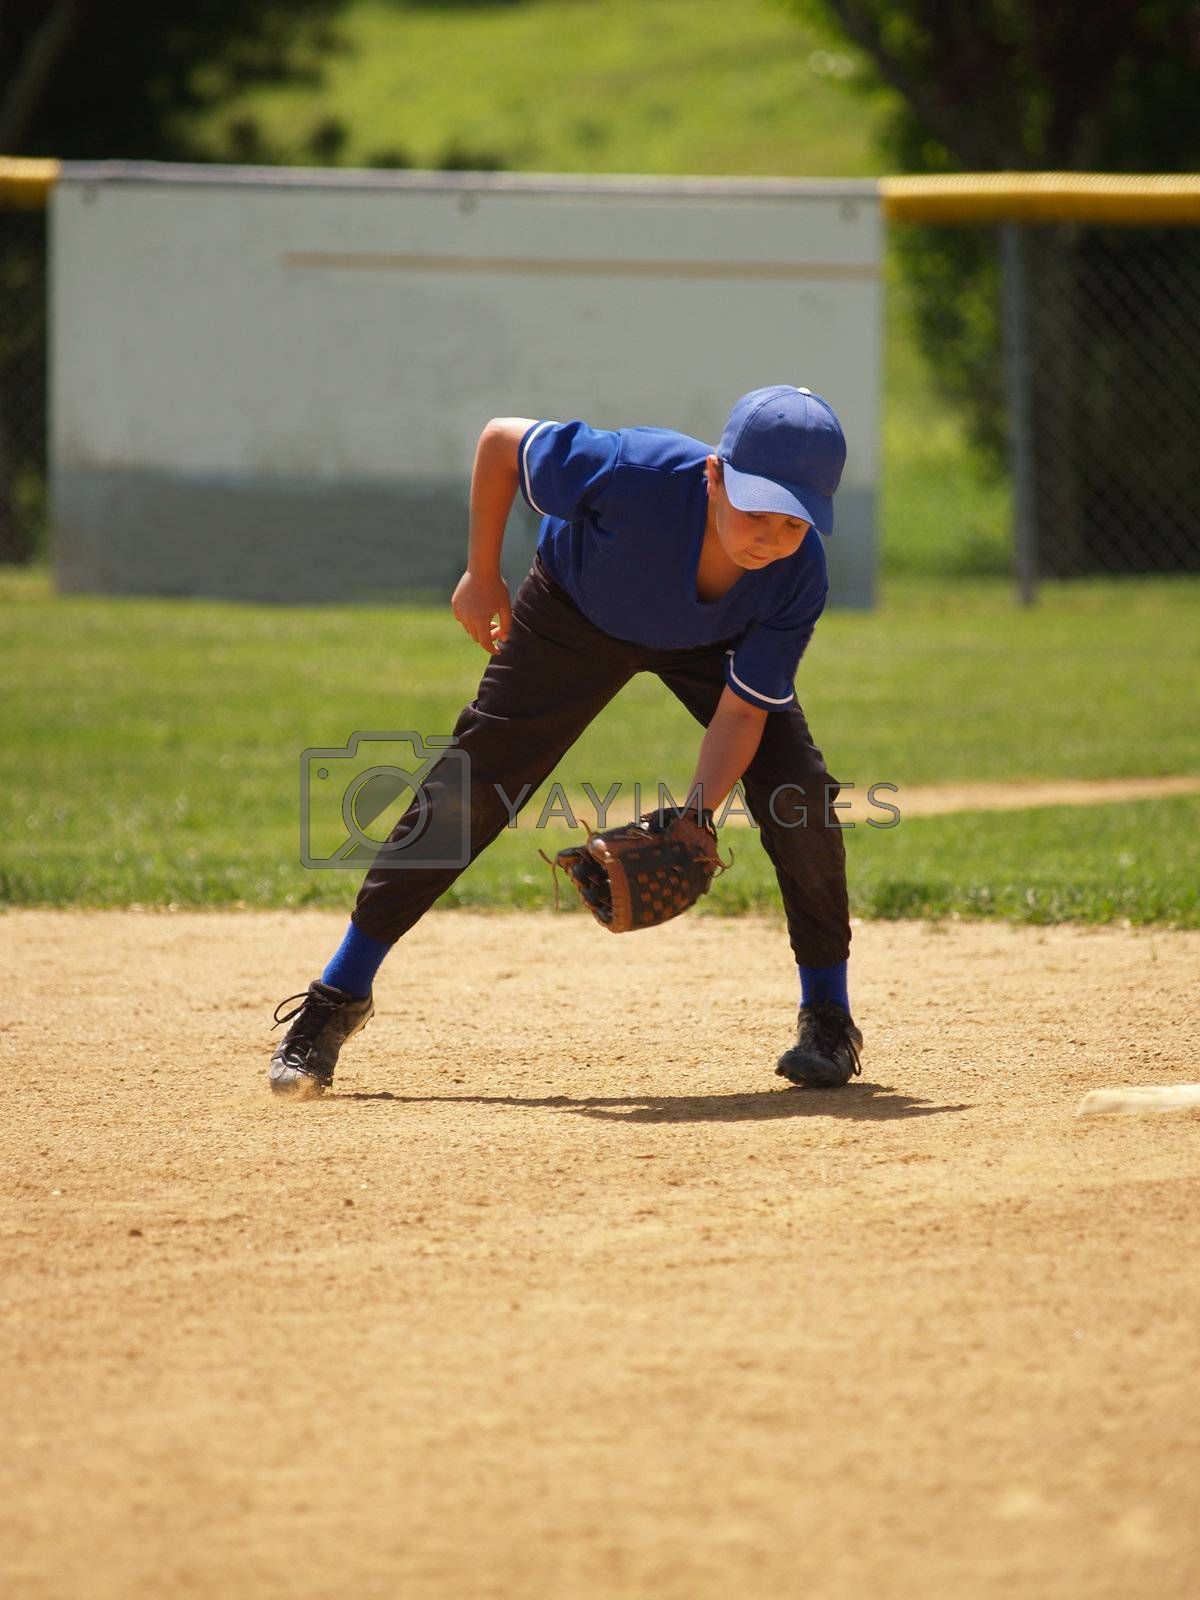 young little league baseball player catching a ground ball